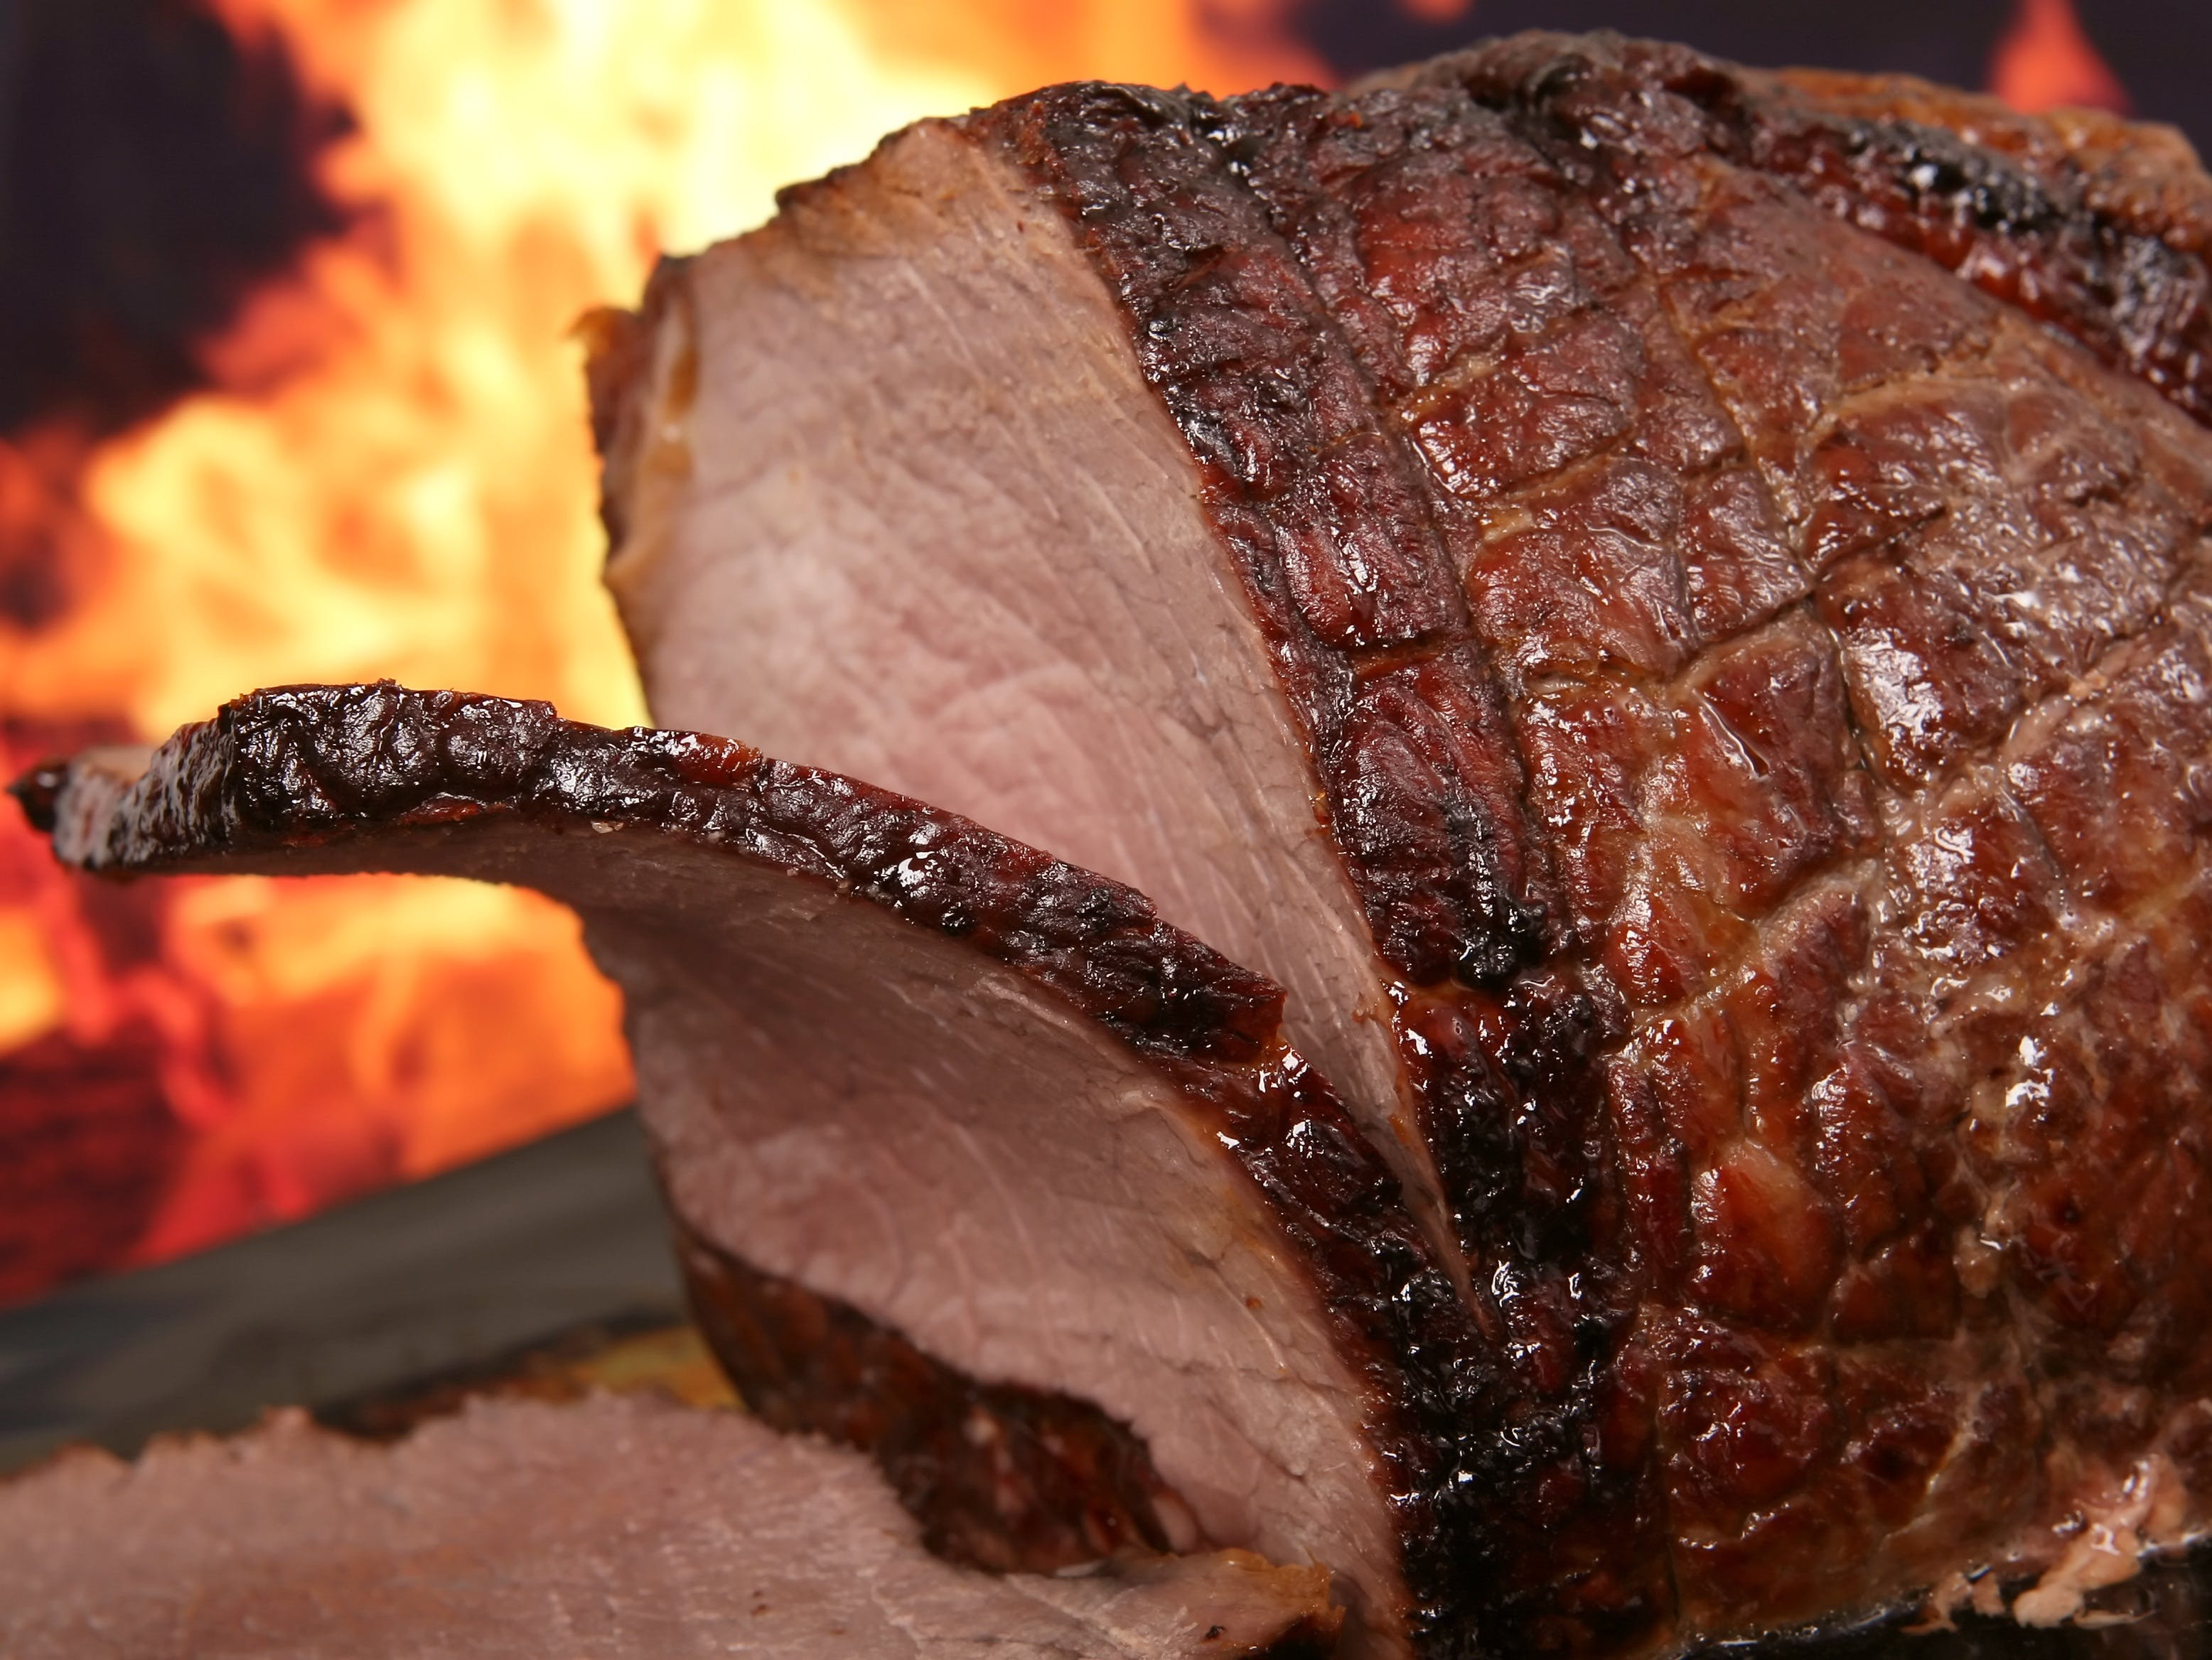 Gratis stockfoto met avondeten, brand, brandende, close-up